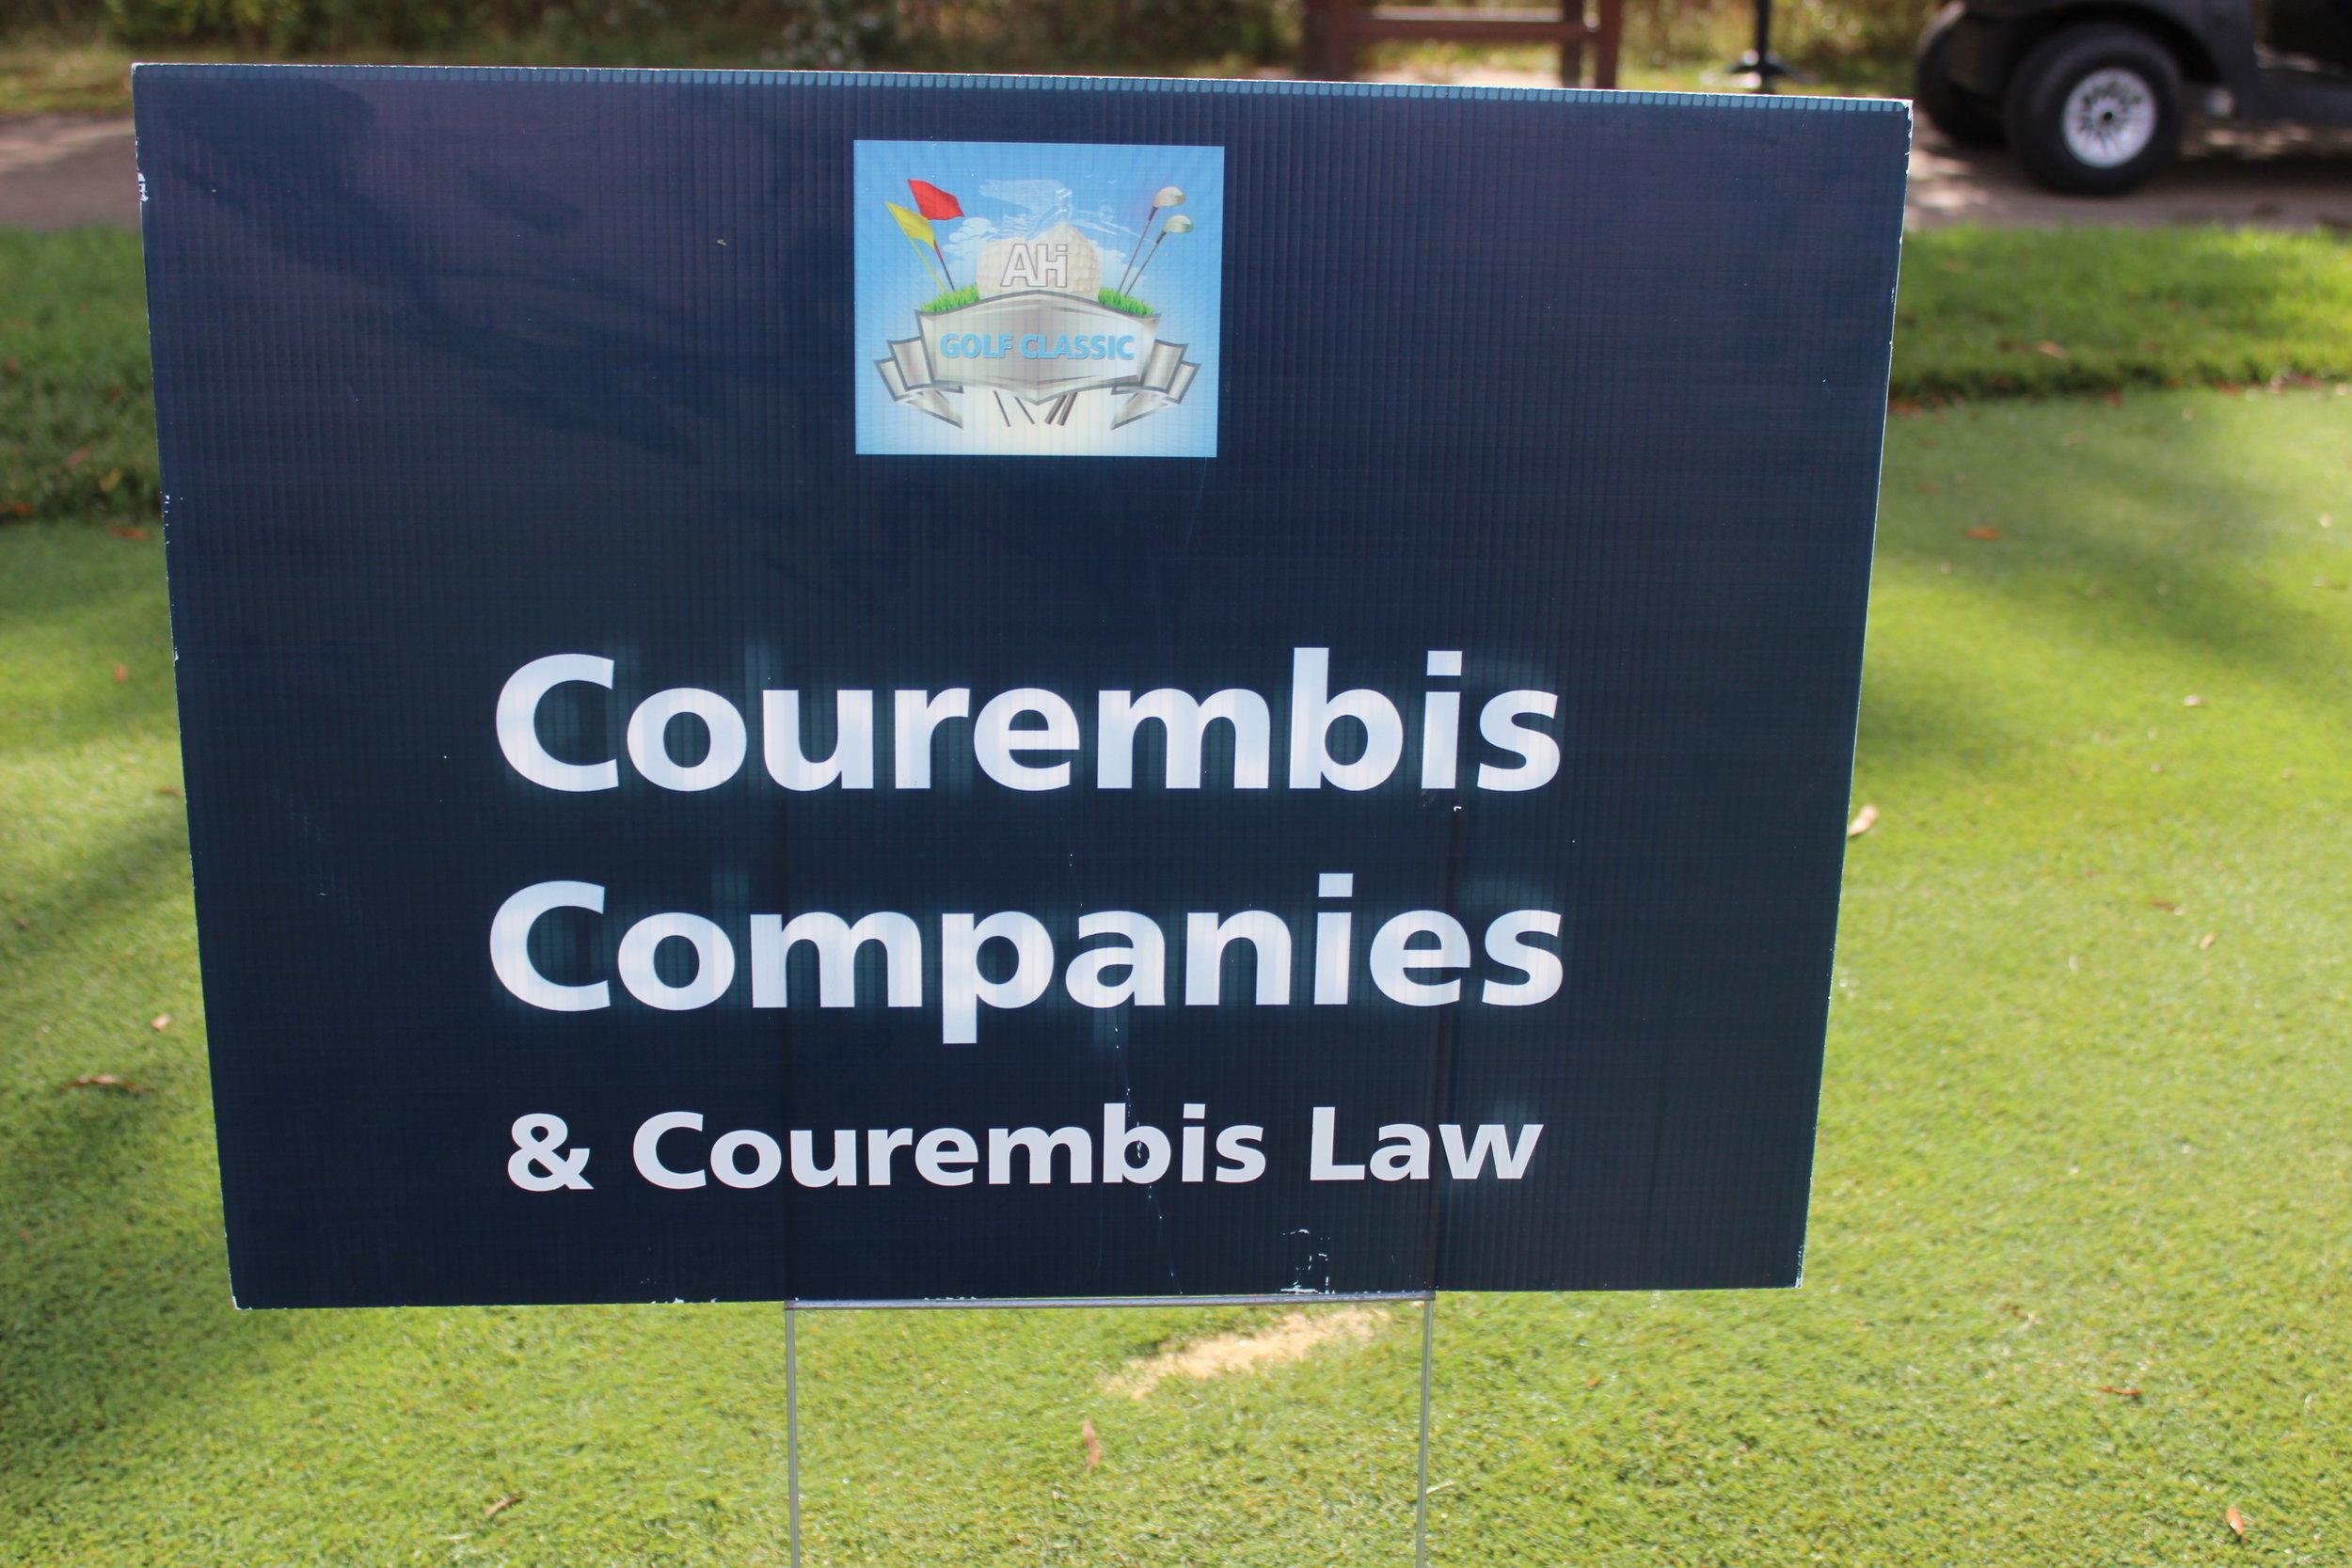 Hole Sponsor, Courembis Companies & Courembis Law.